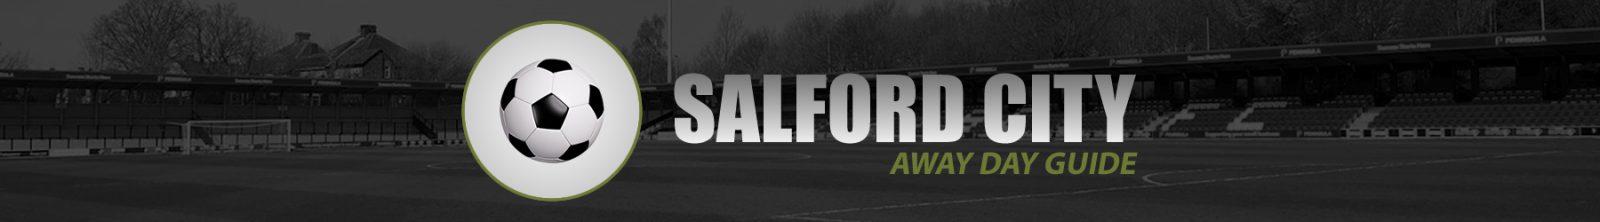 Salford City Away